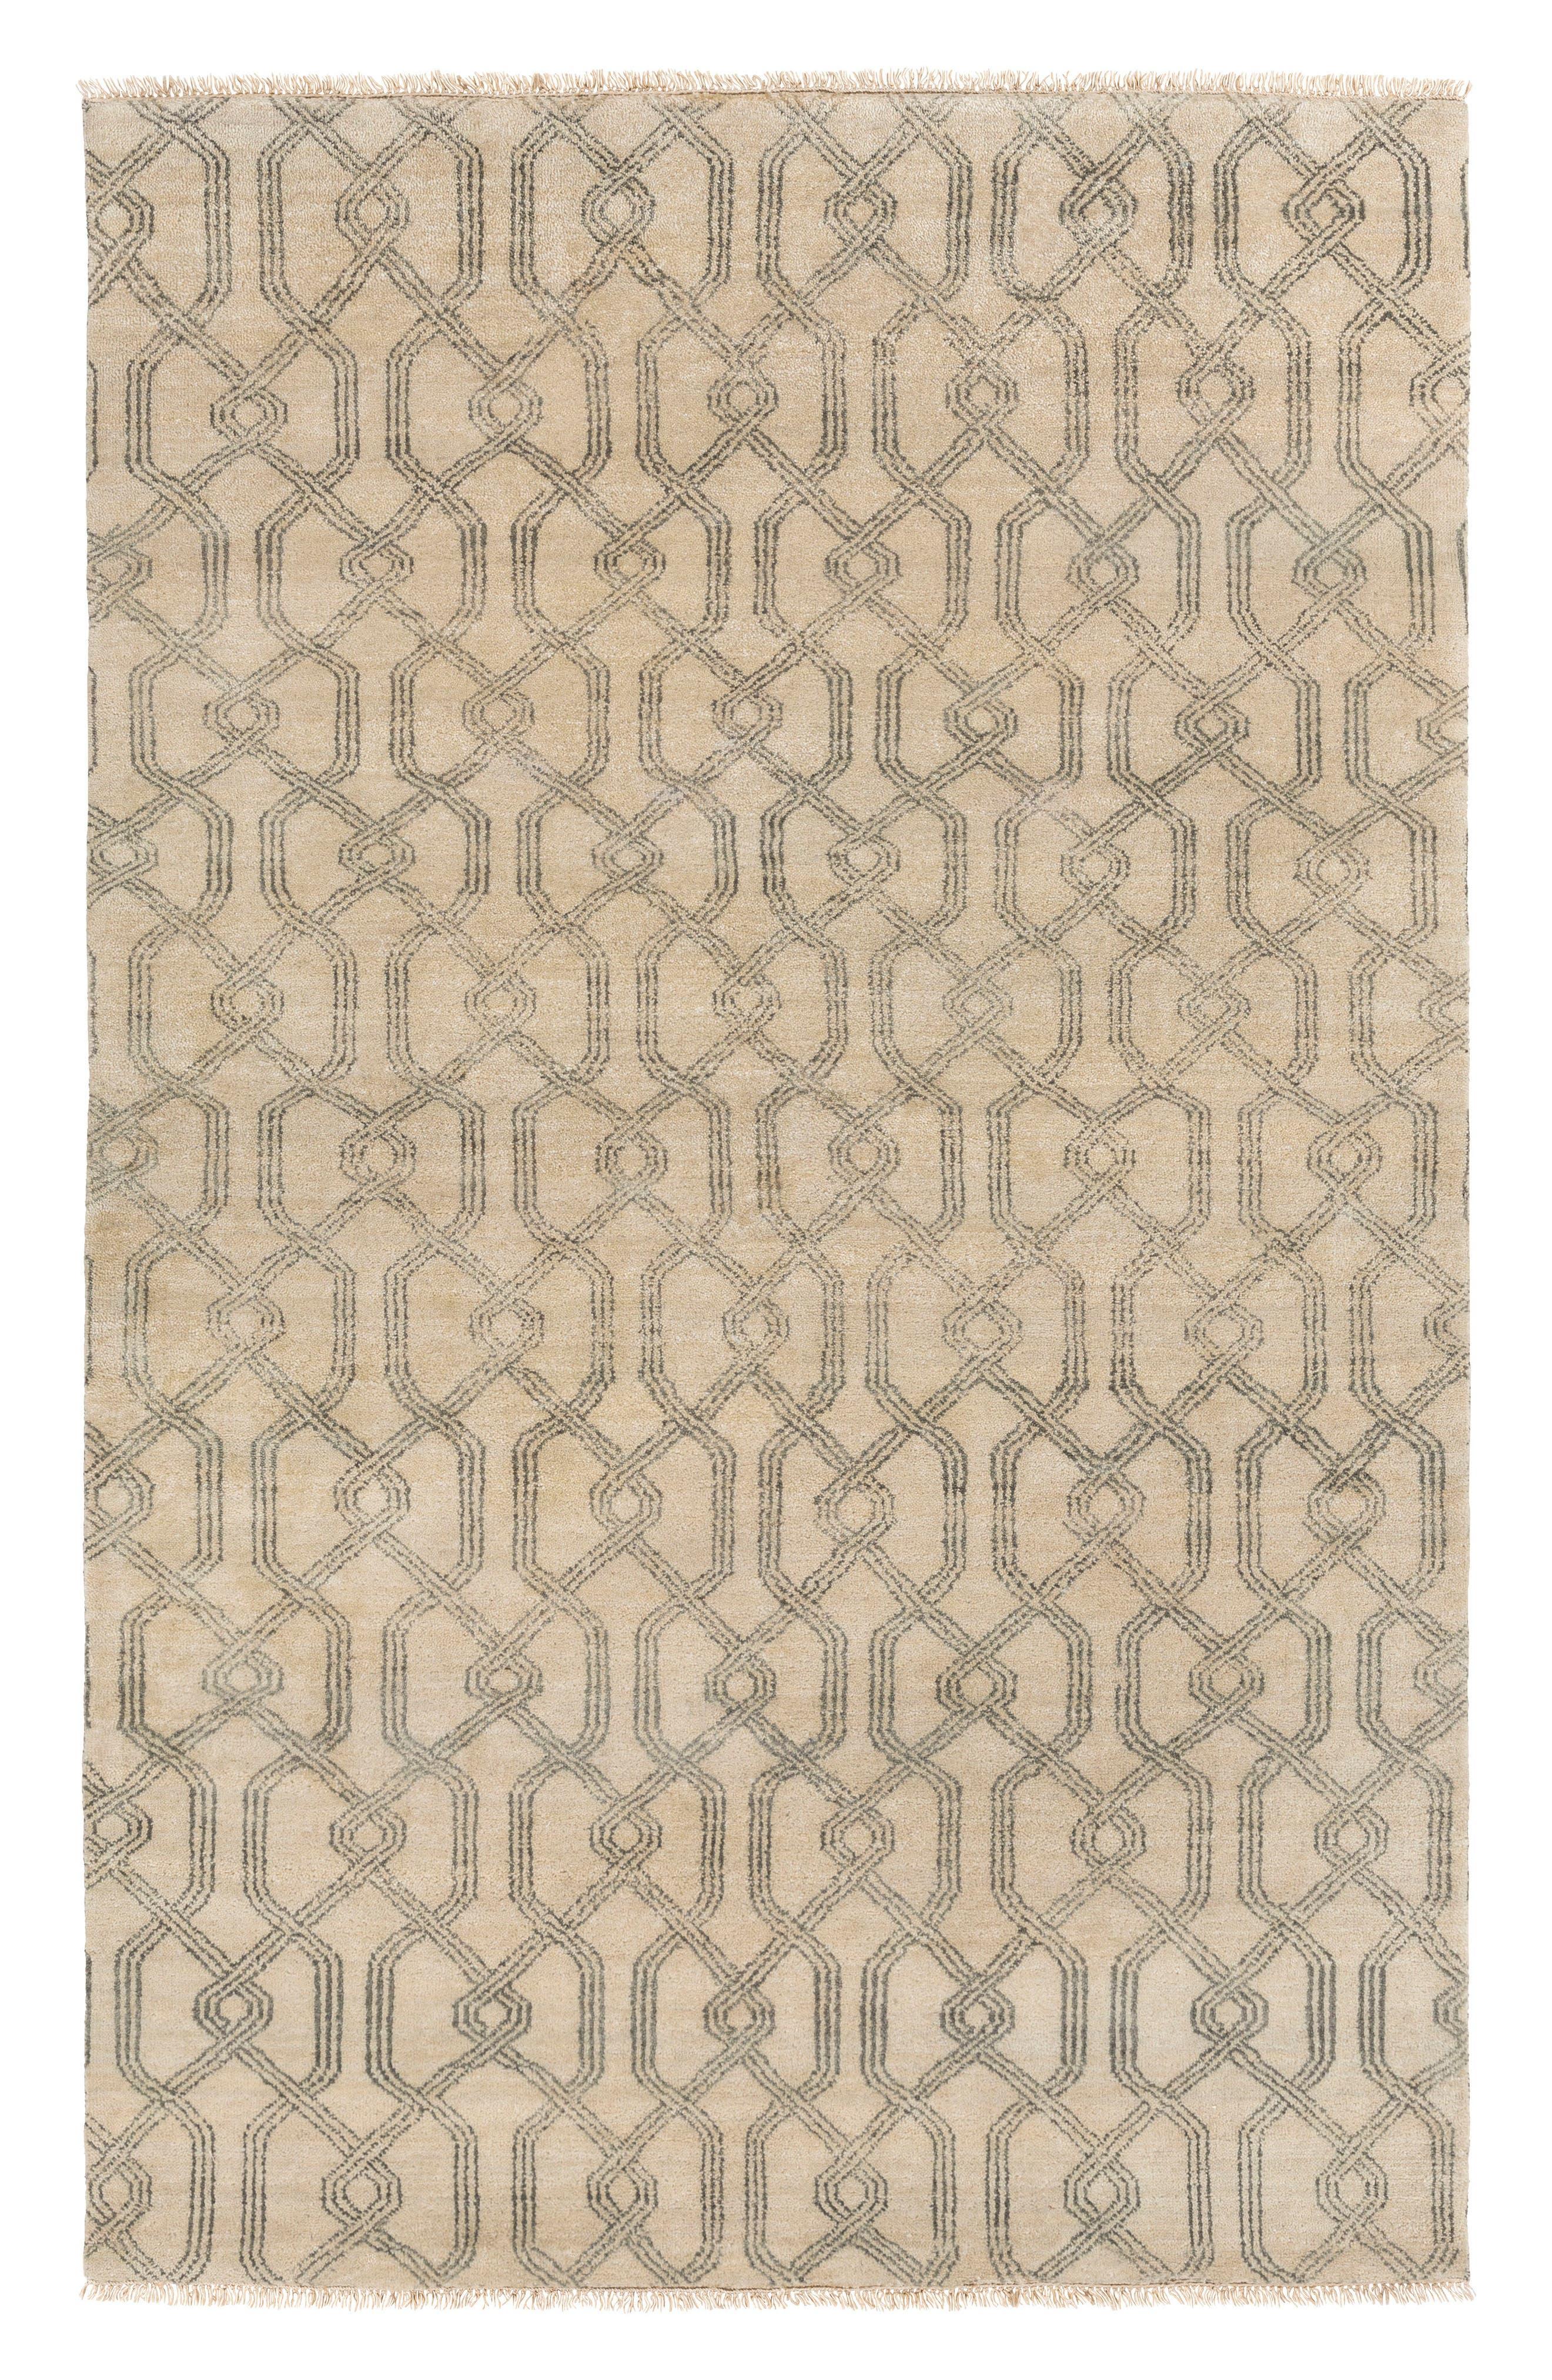 'Stanton' Wool & Cotton Rug,                         Main,                         color, 020